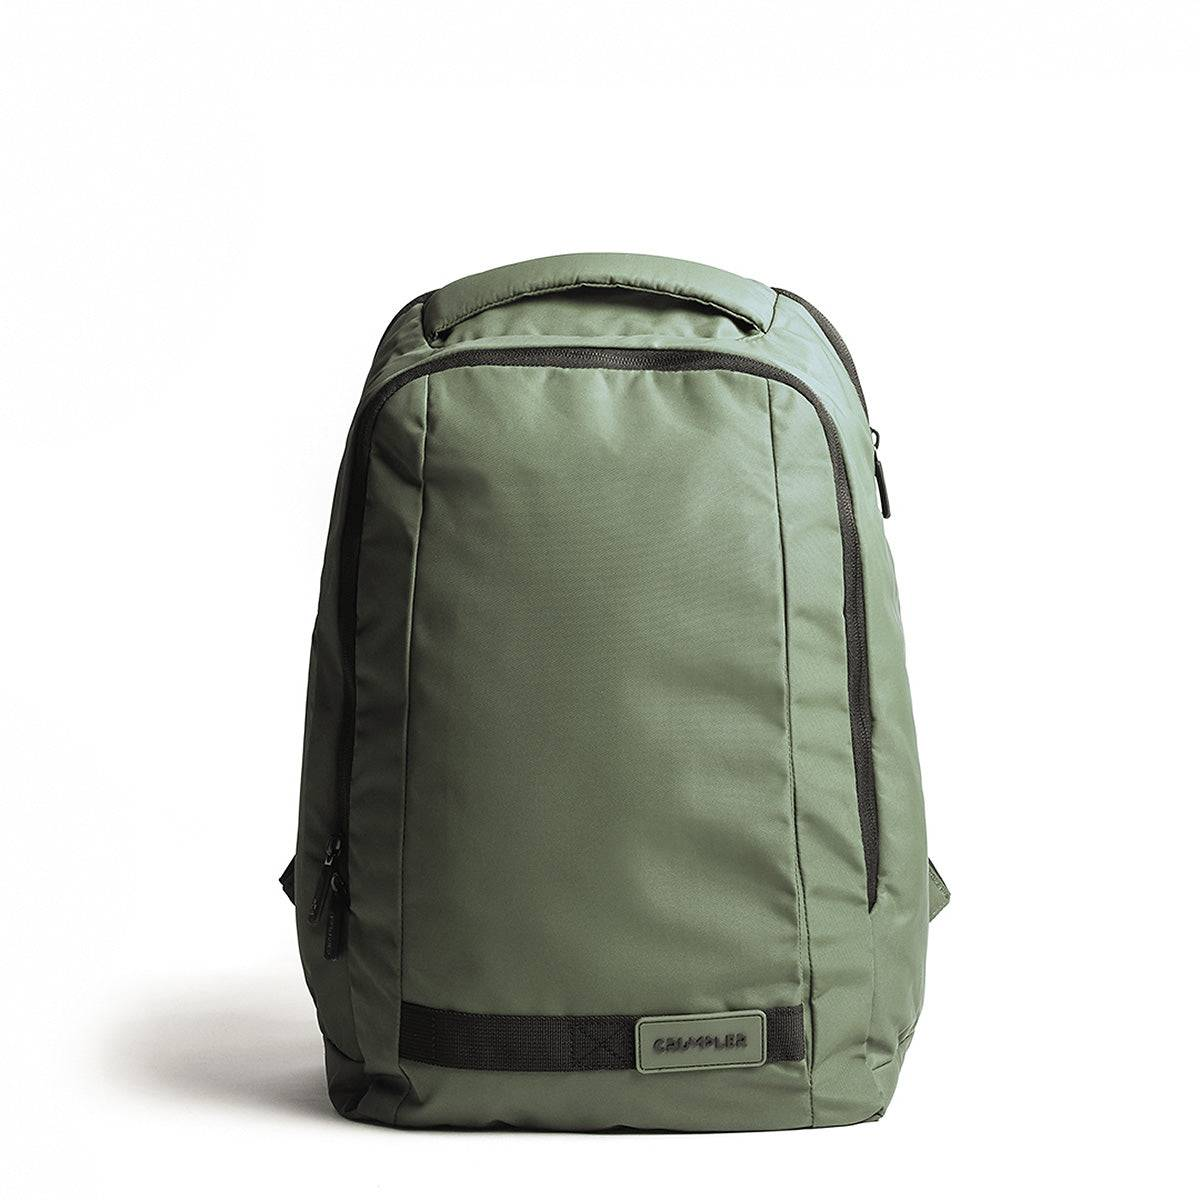 Crumpler Shuttle Delight 15 inch Laptop Backpack tactical green 20.6 l L